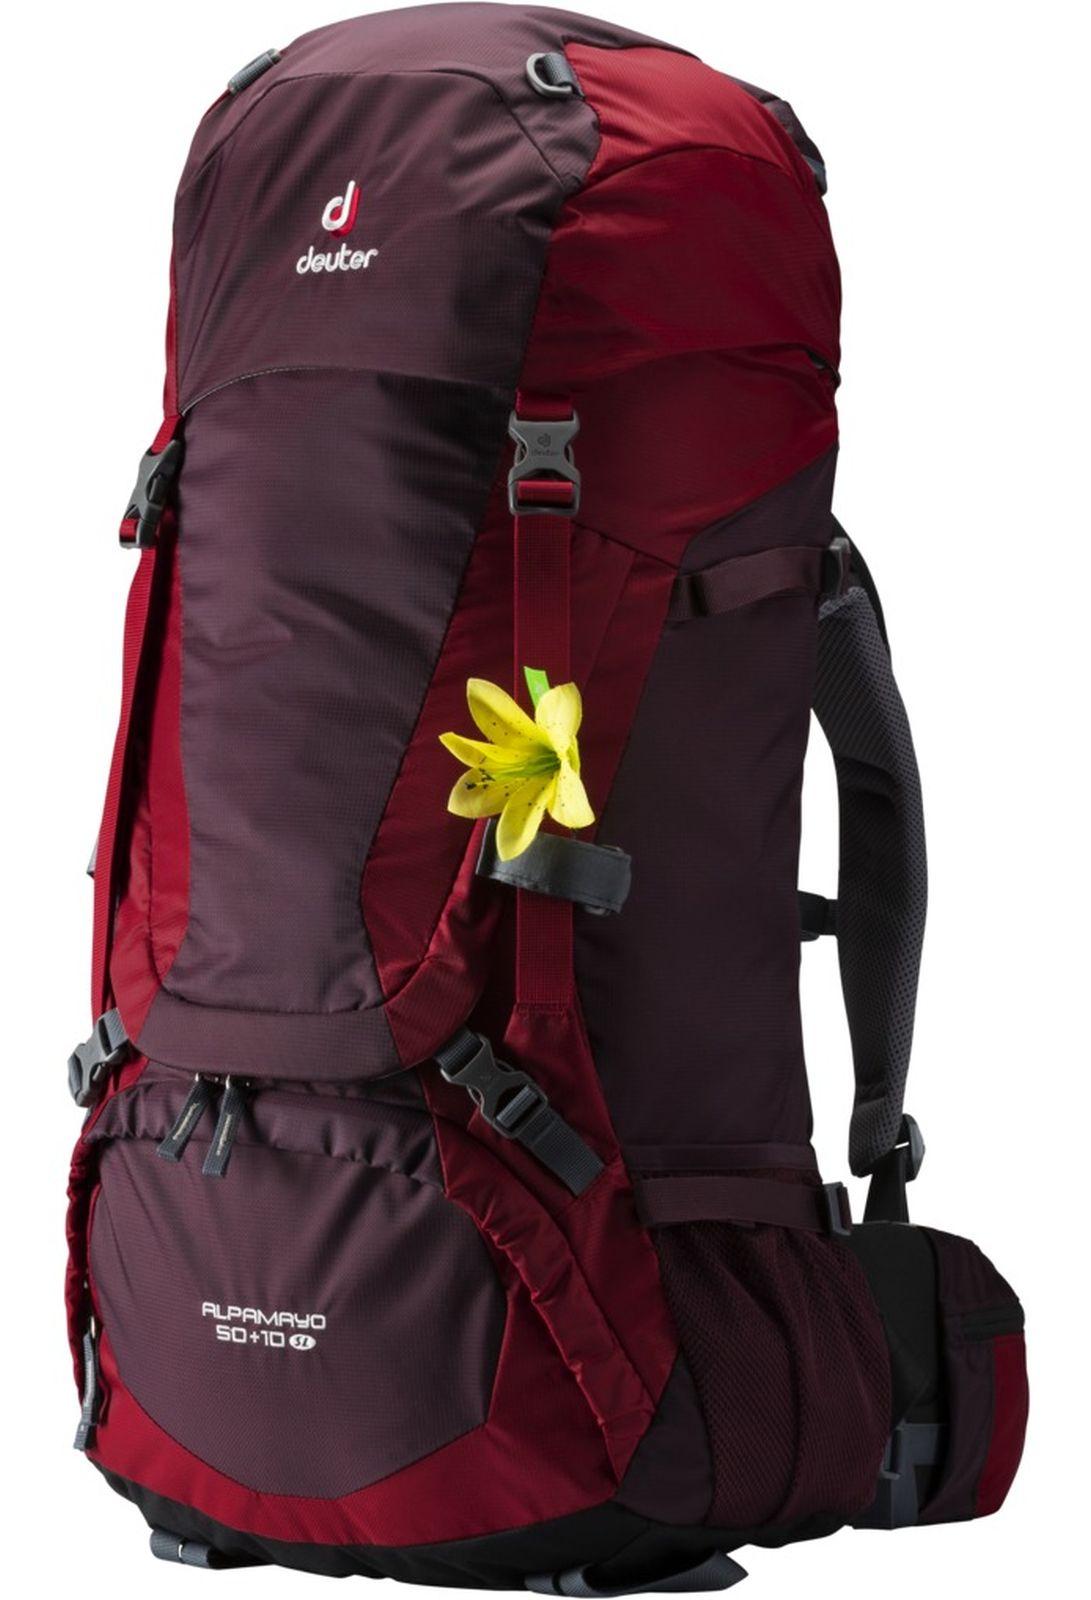 release info on lowest discount running shoes Deuter Damen-Wander-Outdoor-Expeditions-Rucksack Alpamayo 50 + 10 SL  aubergine | eBay